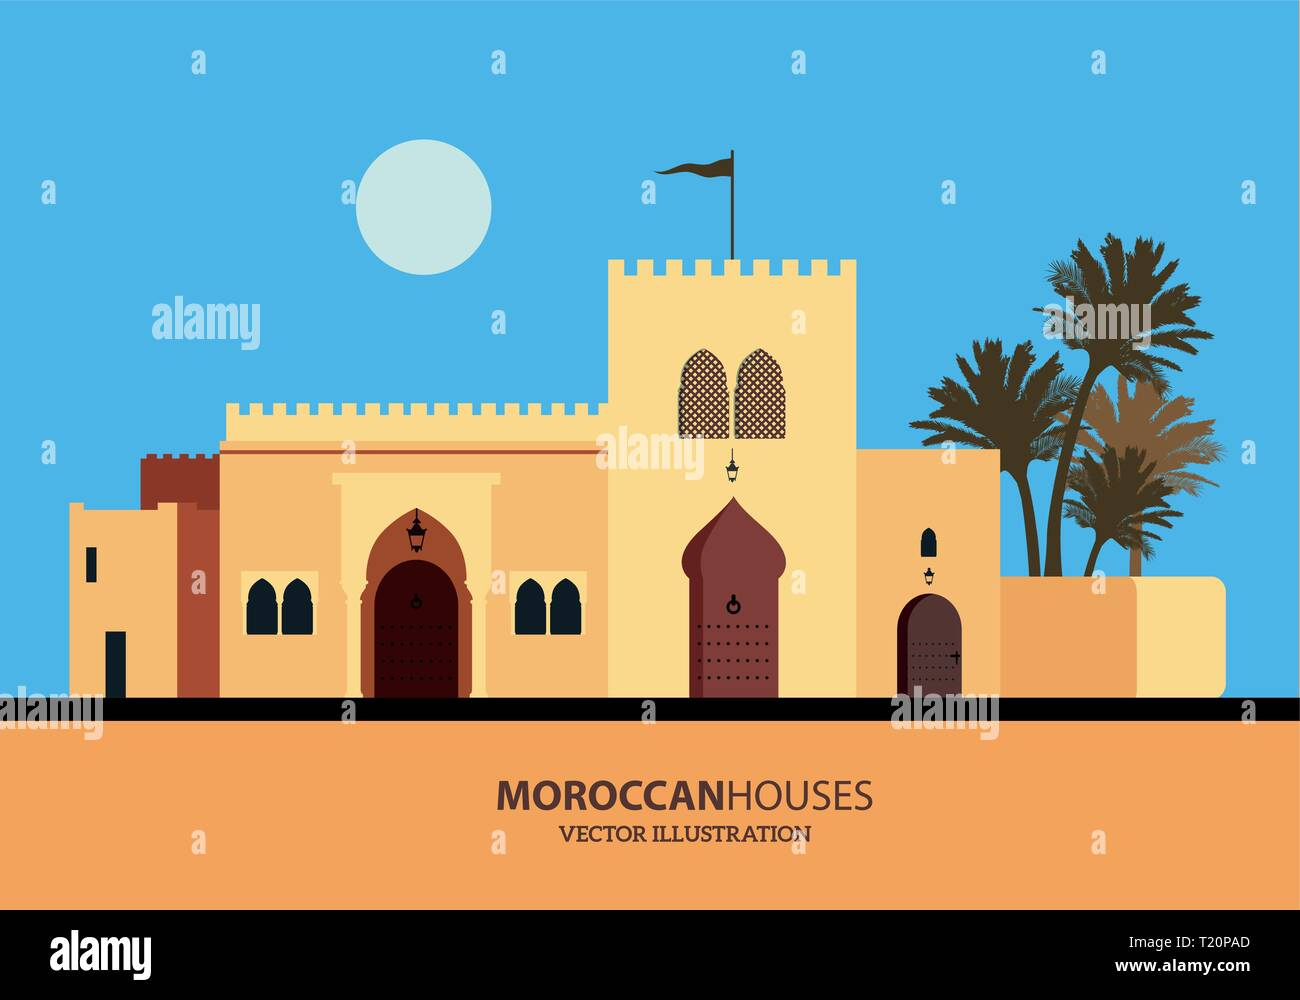 Mediterranean Moroccan or Arabic style houses set. Vector Illustration - Stock Vector